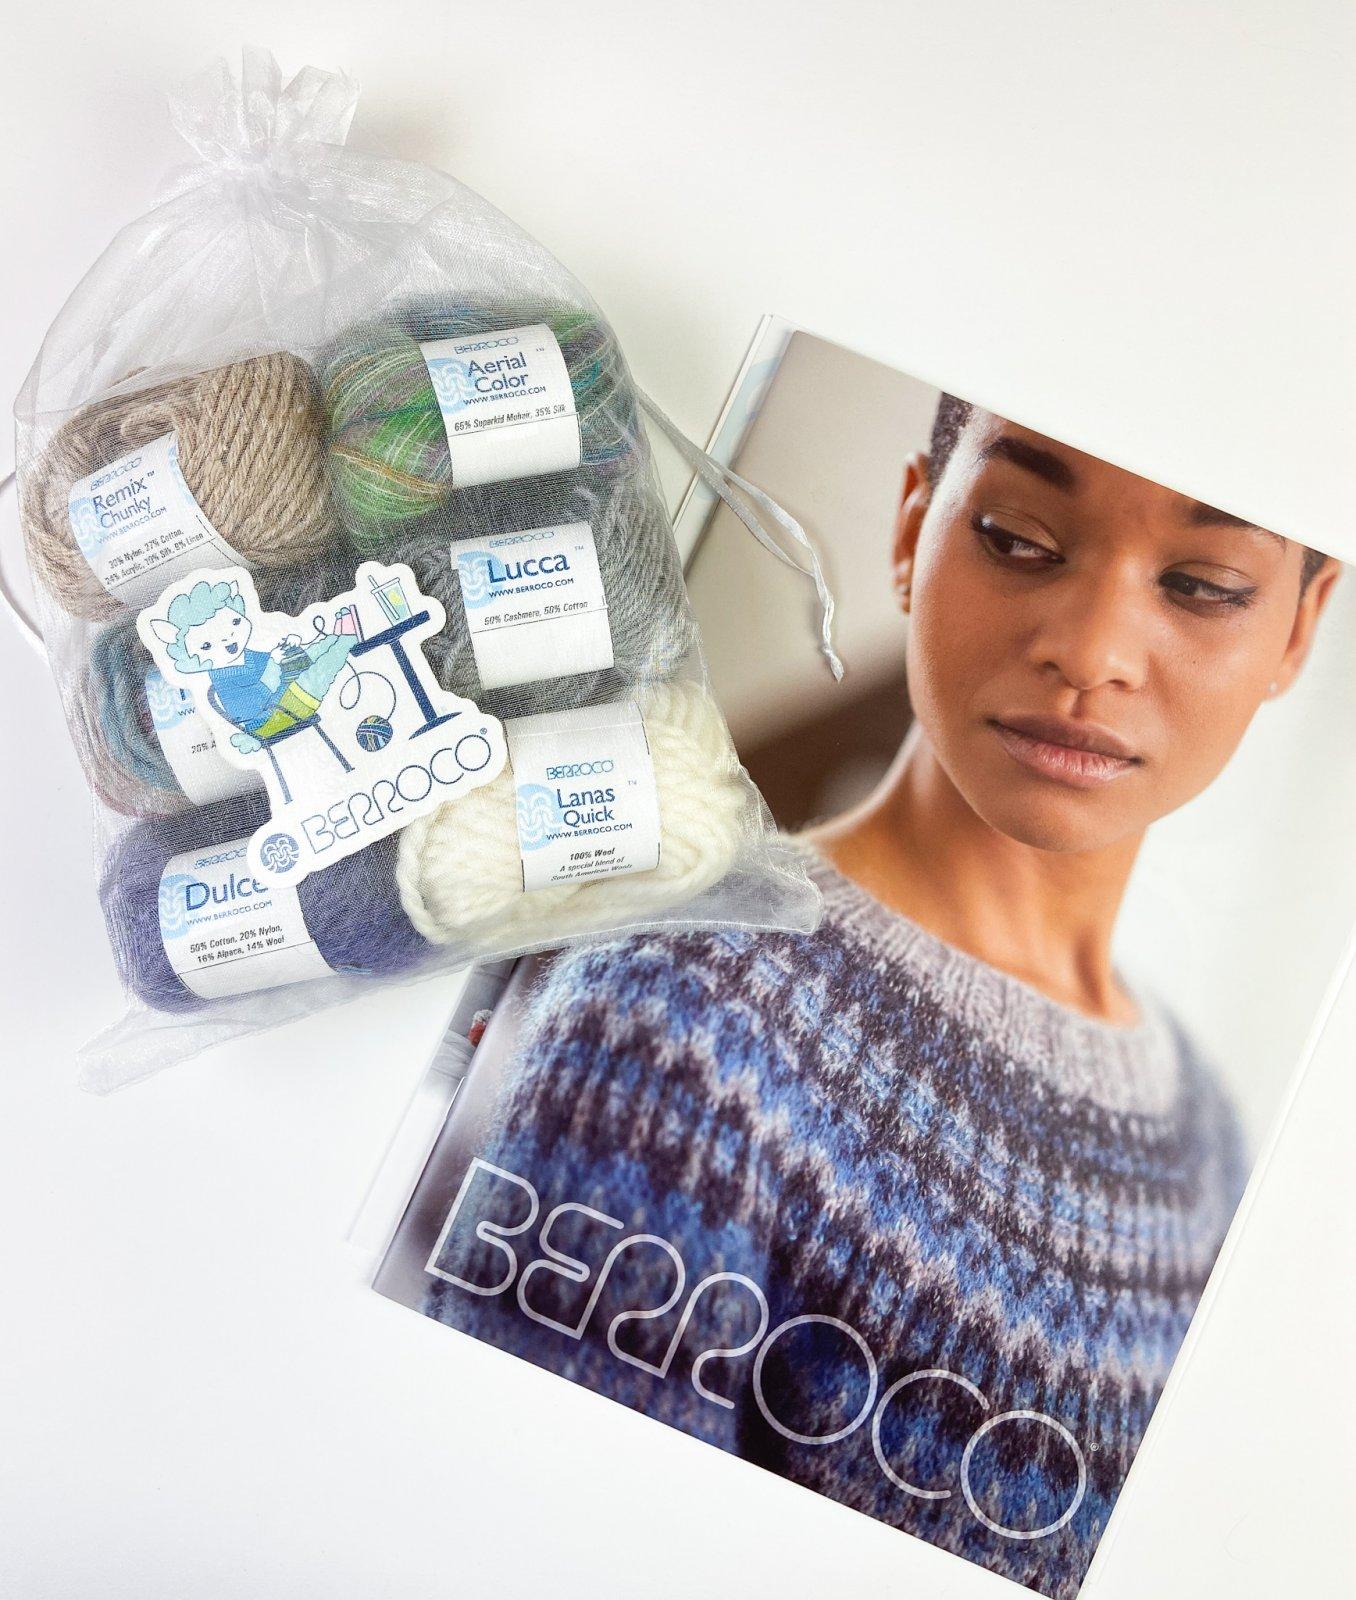 Berroco Home Yarn Tasting Kit